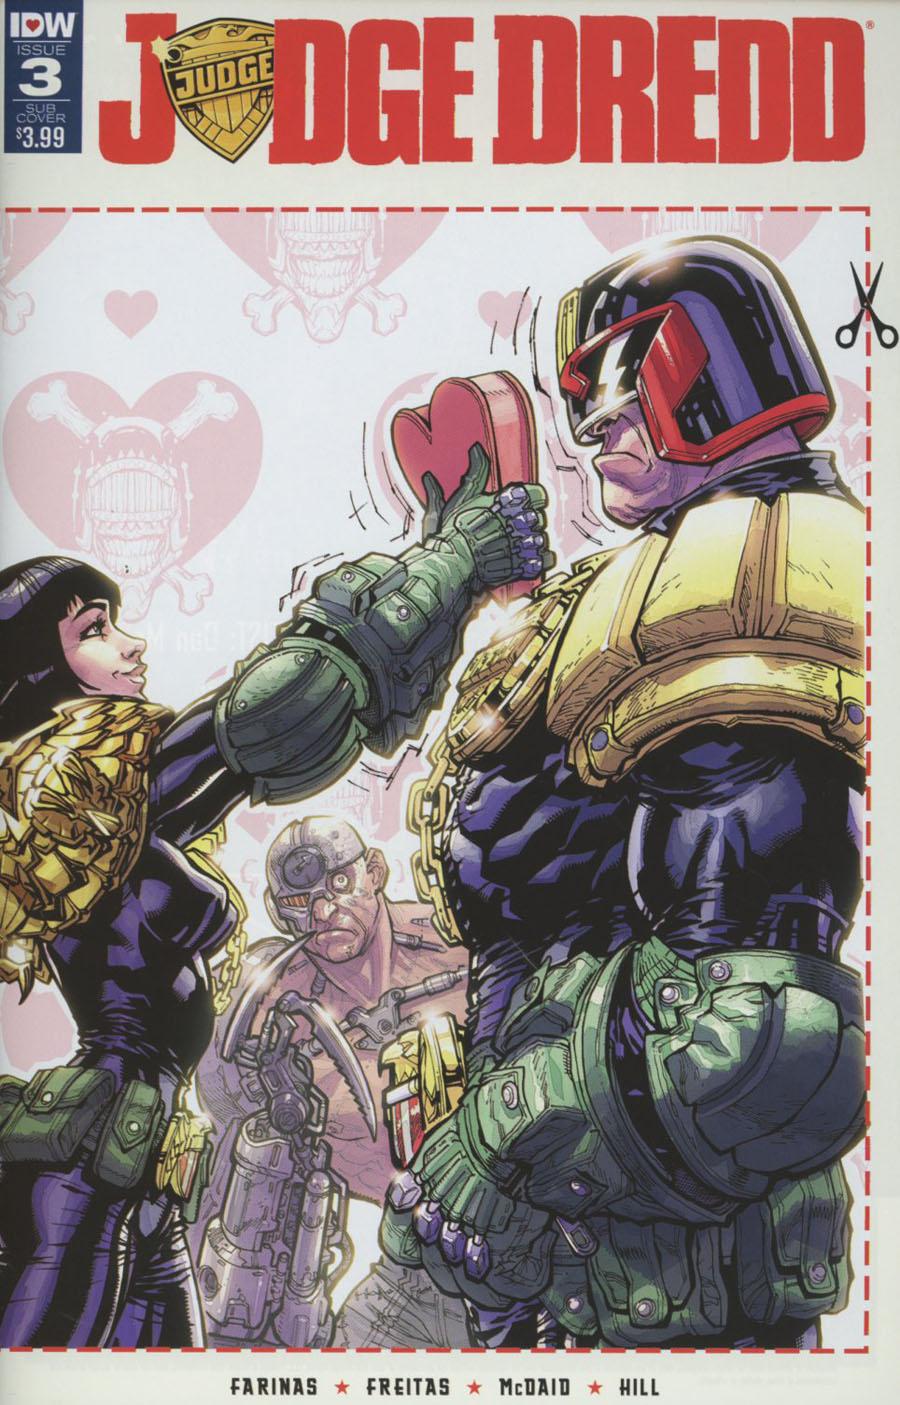 Judge Dredd Vol 5 #3 Cover C Variant Carlos DAnda Valentines Day Card Cover